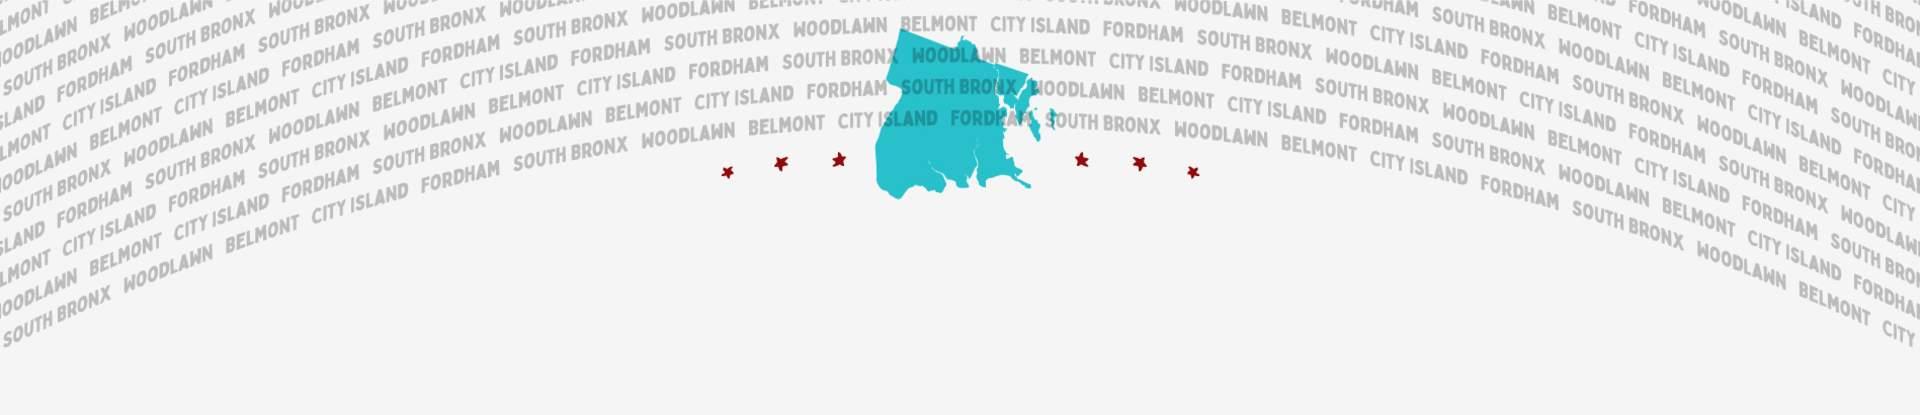 new york city The Bronx